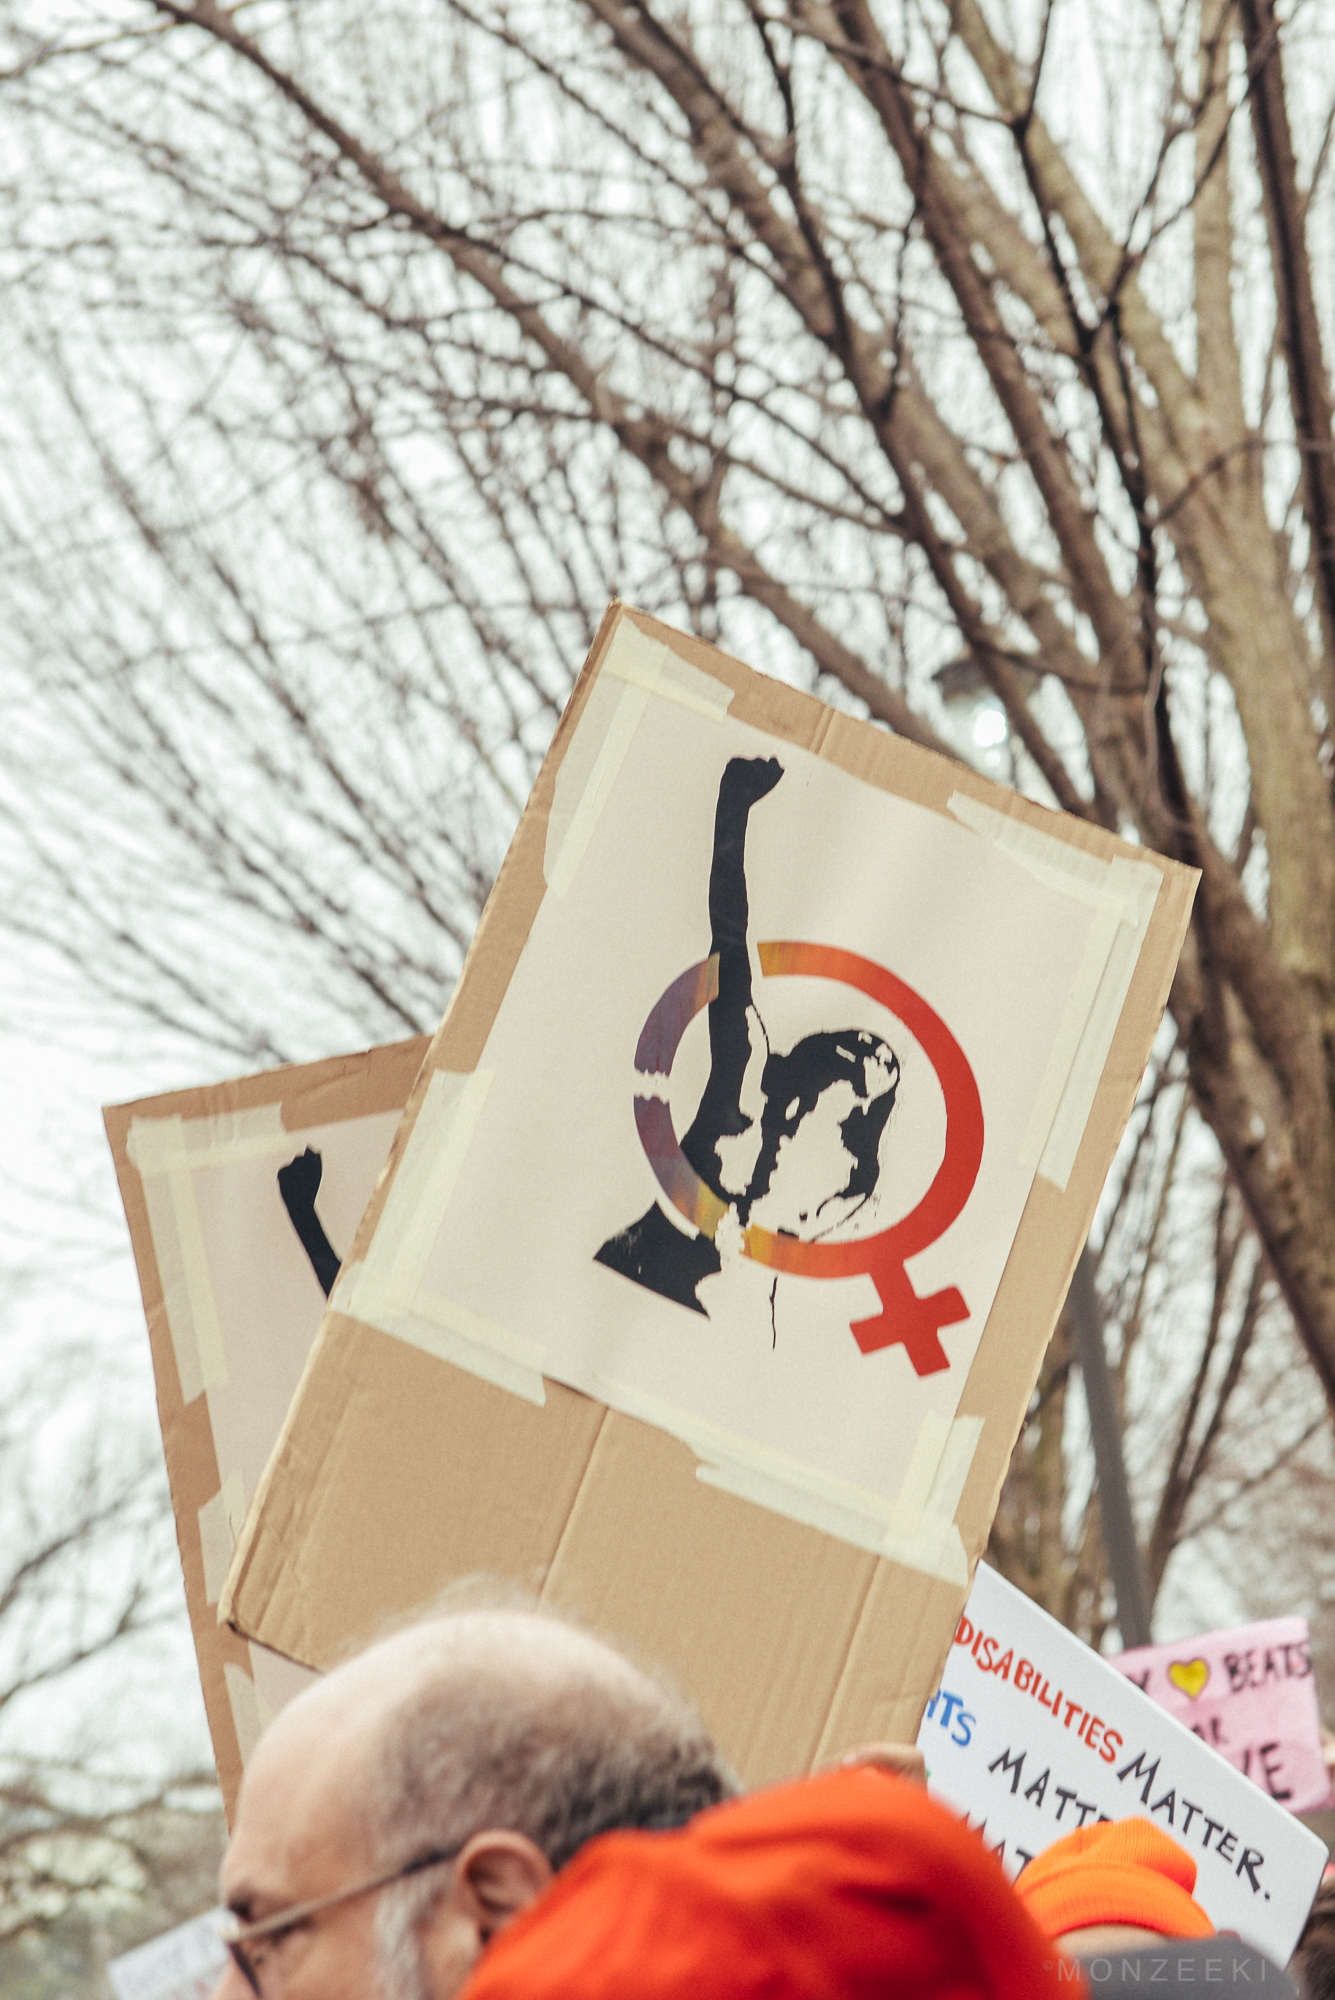 20170121-womens-march-dc-2485.jpg